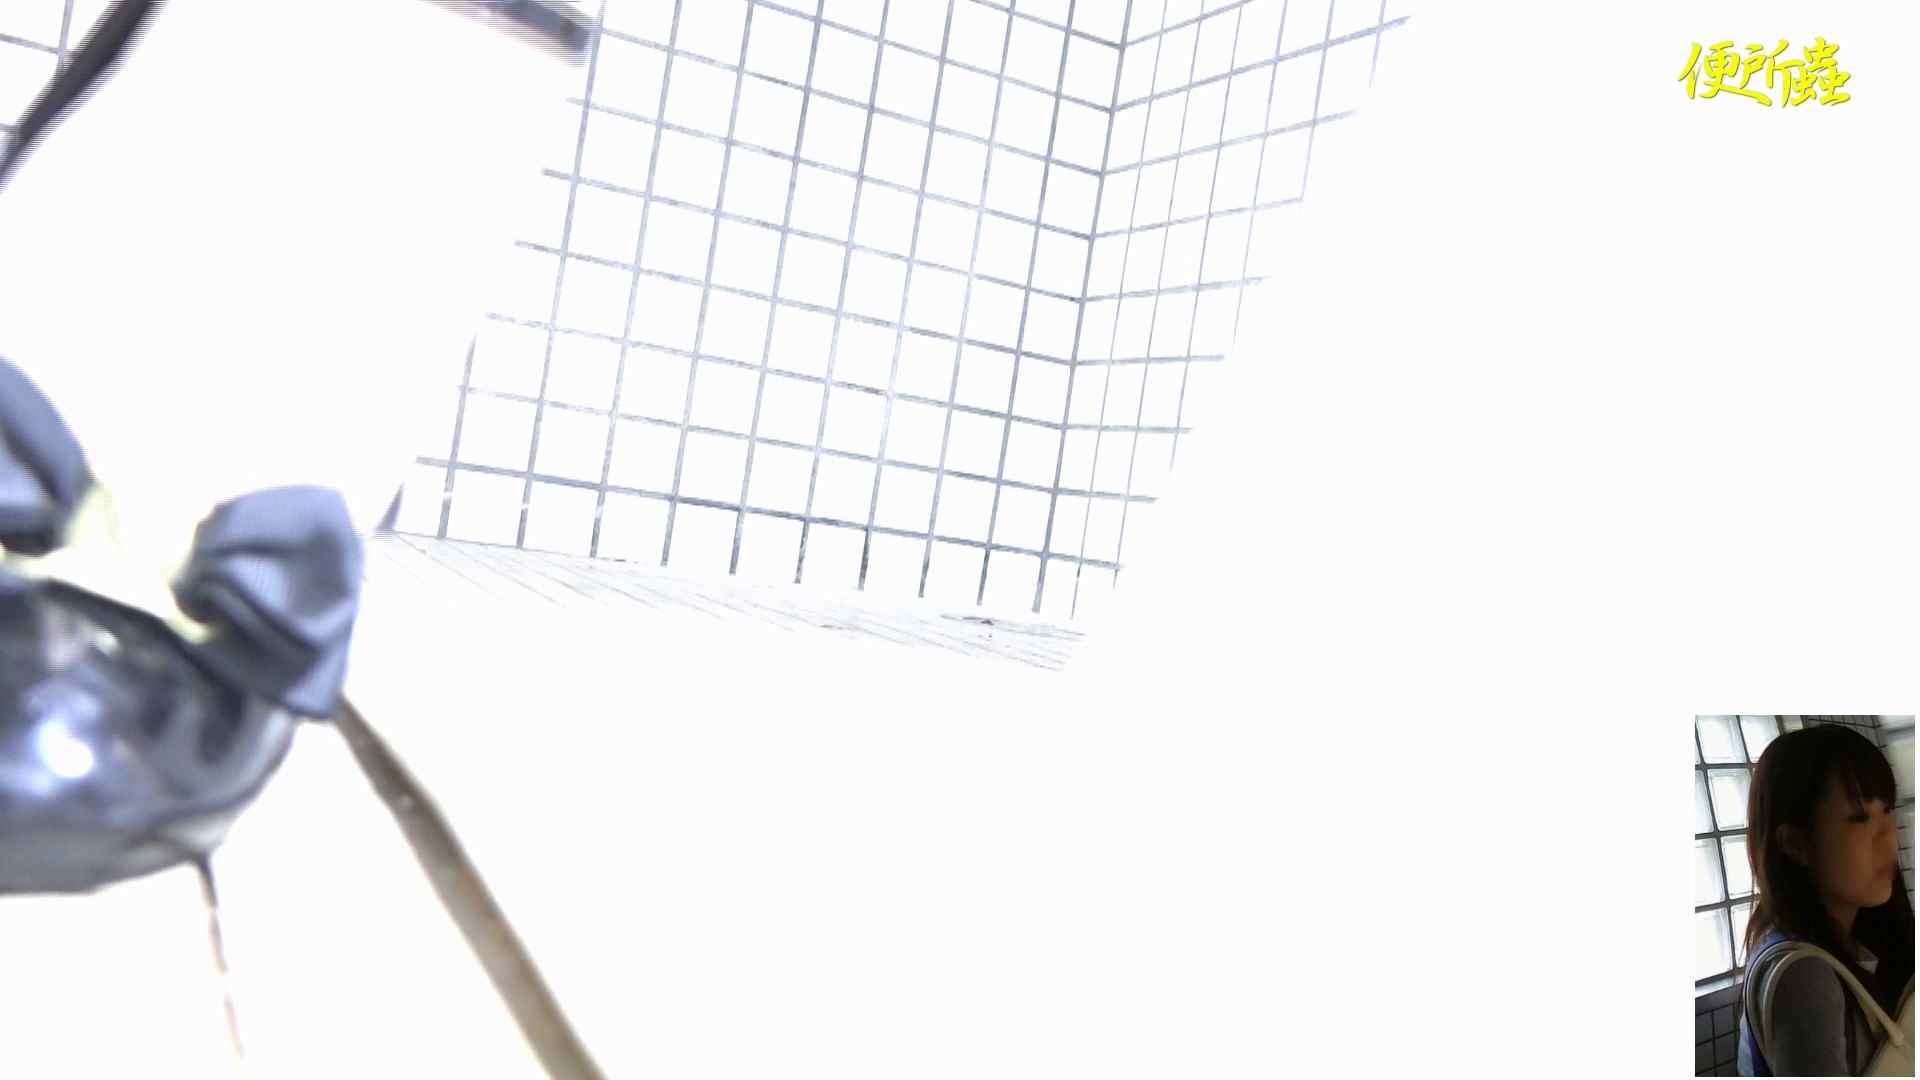 vol.01 便所蟲さんのリターン~便所蟲2匹目~ 盛合せ セックス無修正動画無料 106画像 33